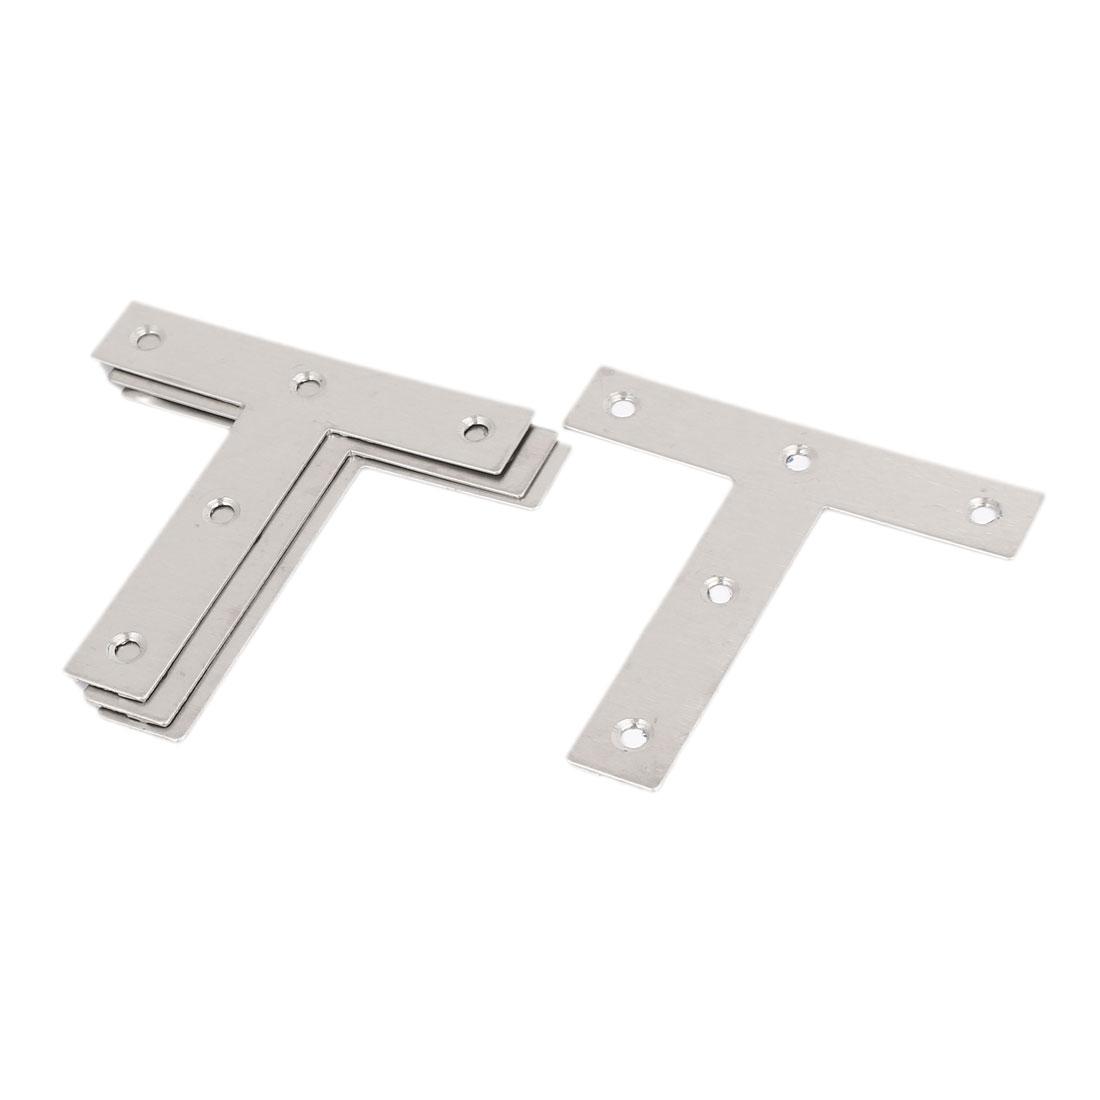 80mmx80mm T Shape Angle Plate Flat Corner Brace Fixing Bracket 4pcs